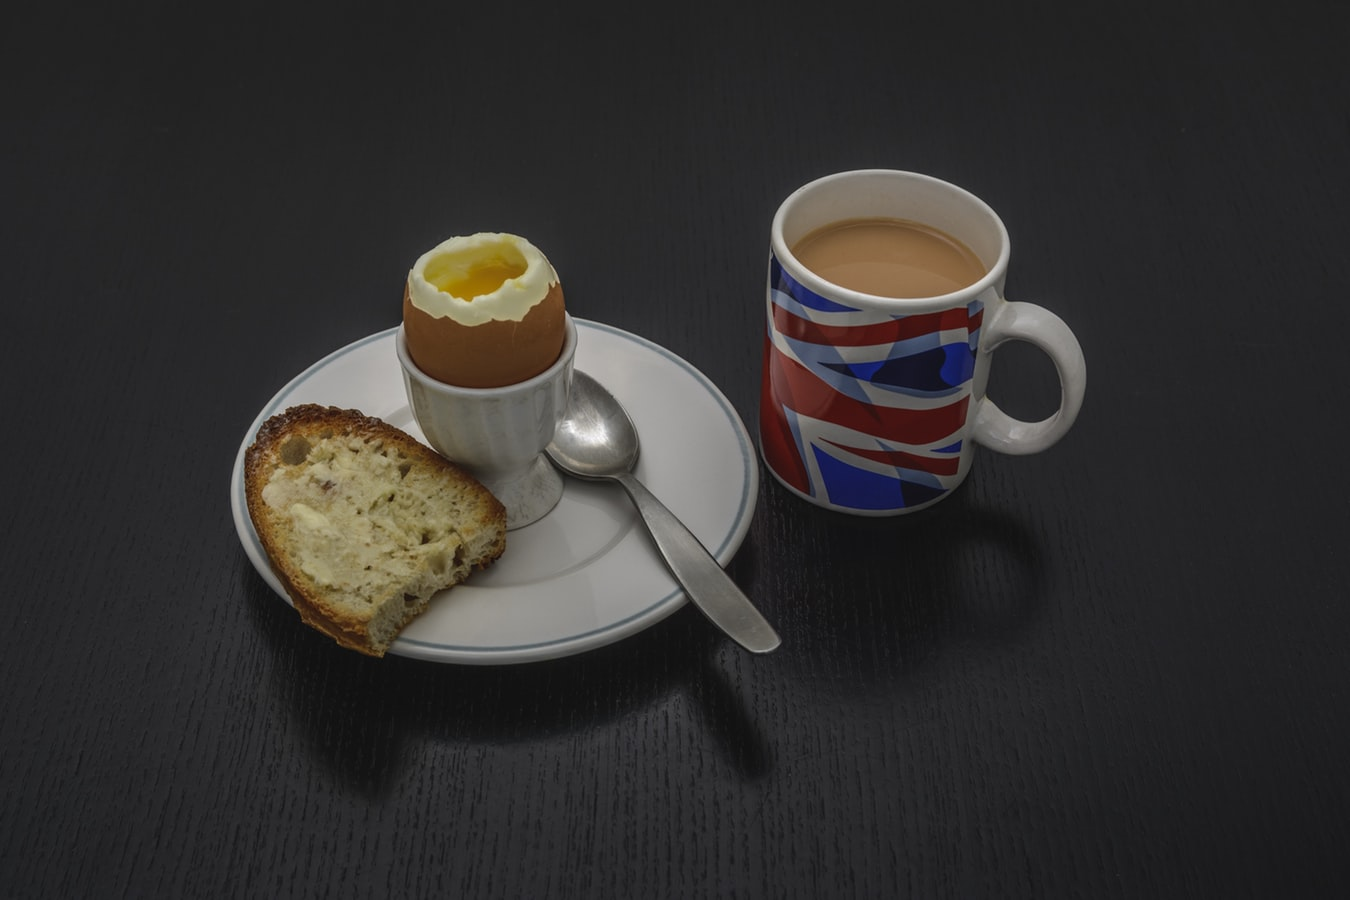 english_lunch_hardis-esn-lille-ssii-grenoble-paris-lyon-nantes-bordeaux-hardis-group